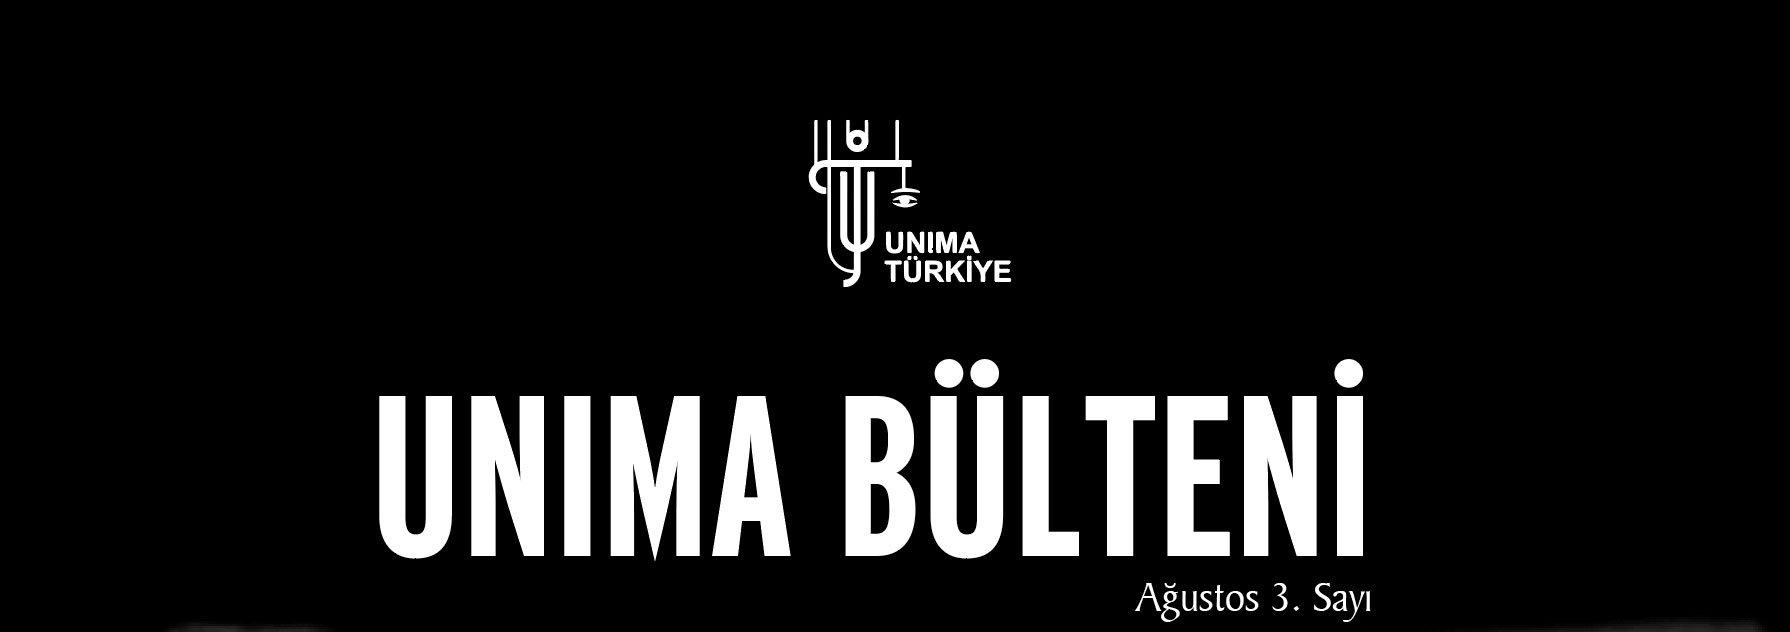 unima-bulten-3-slide